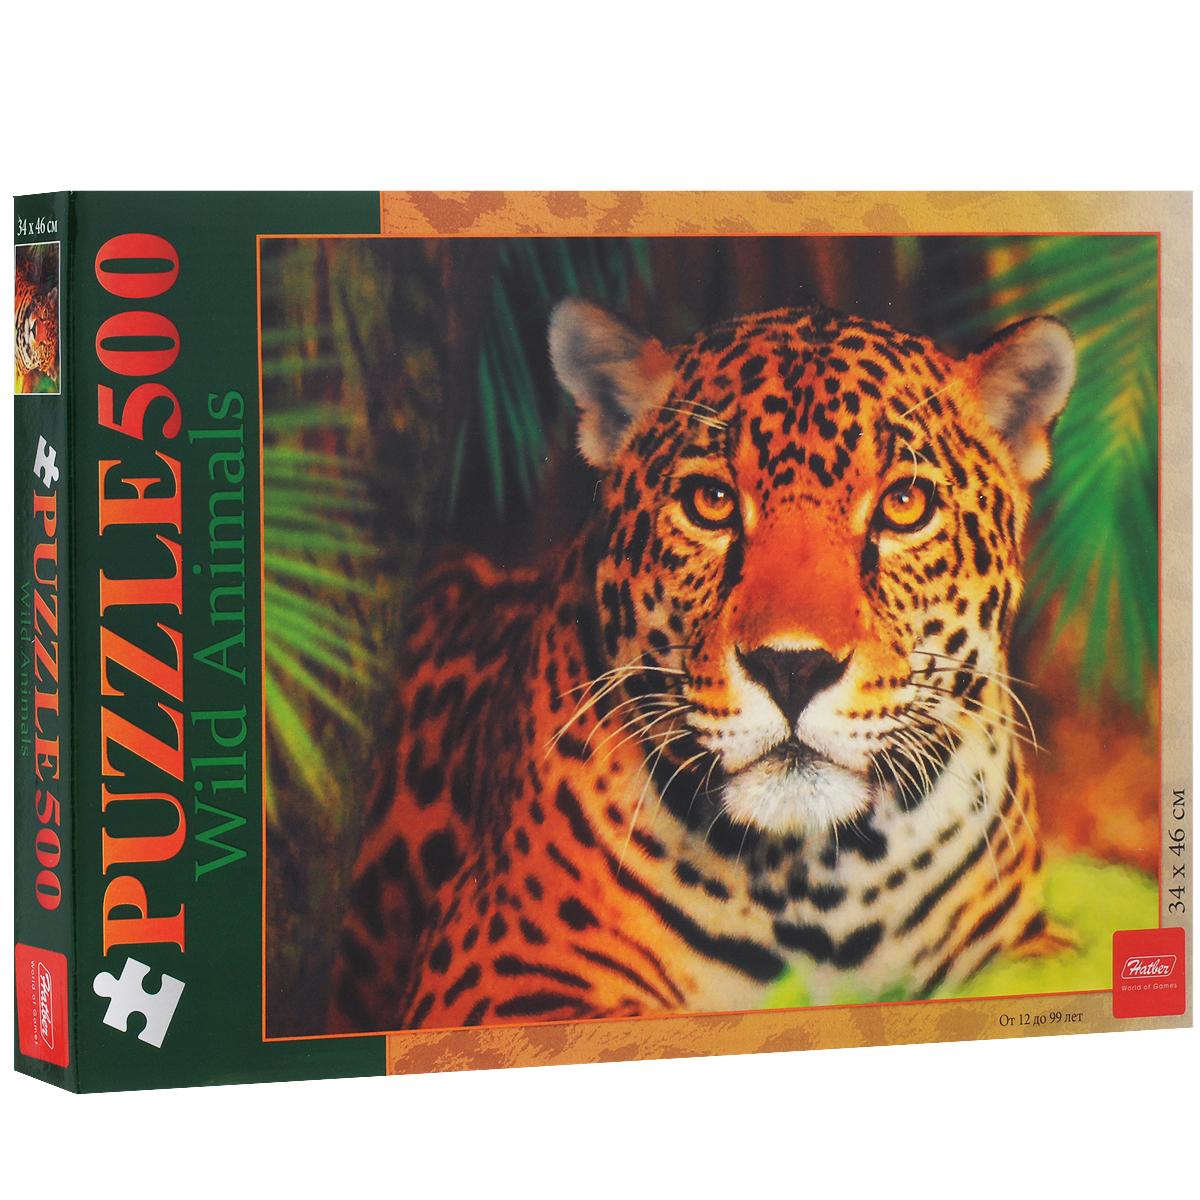 Леопард. Пазл, 500 элементов